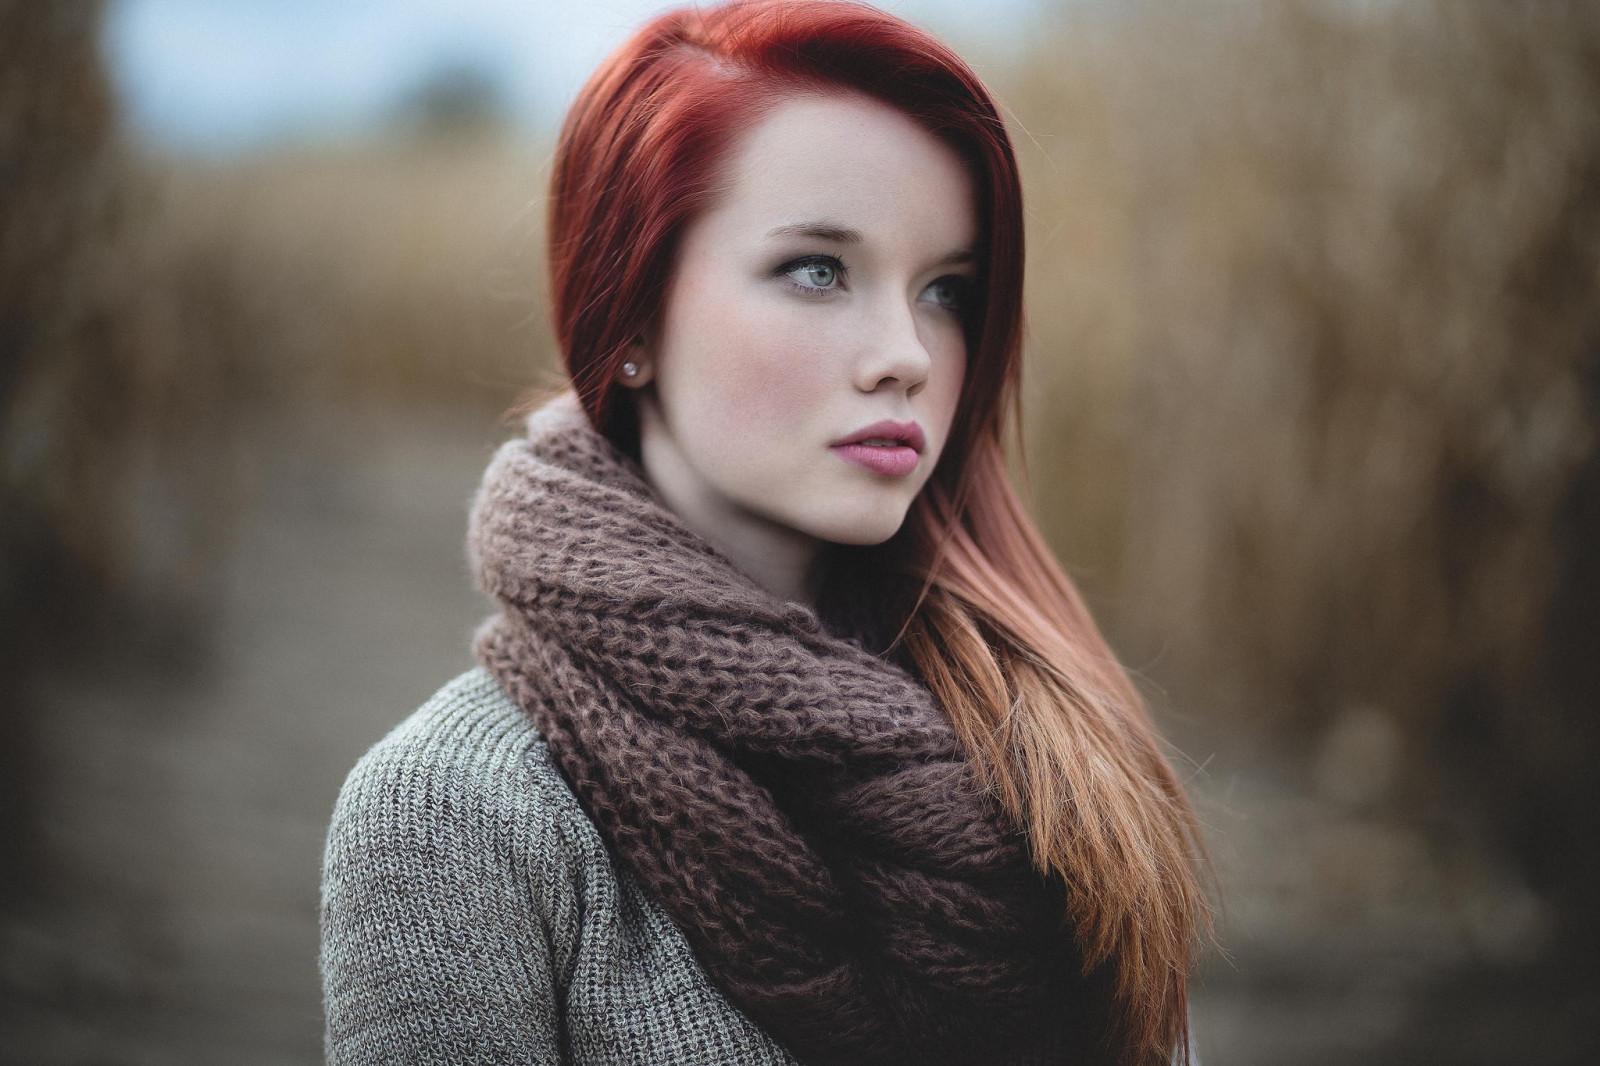 redhead-twenty-two-female-naked-pics-of-tyra-banks